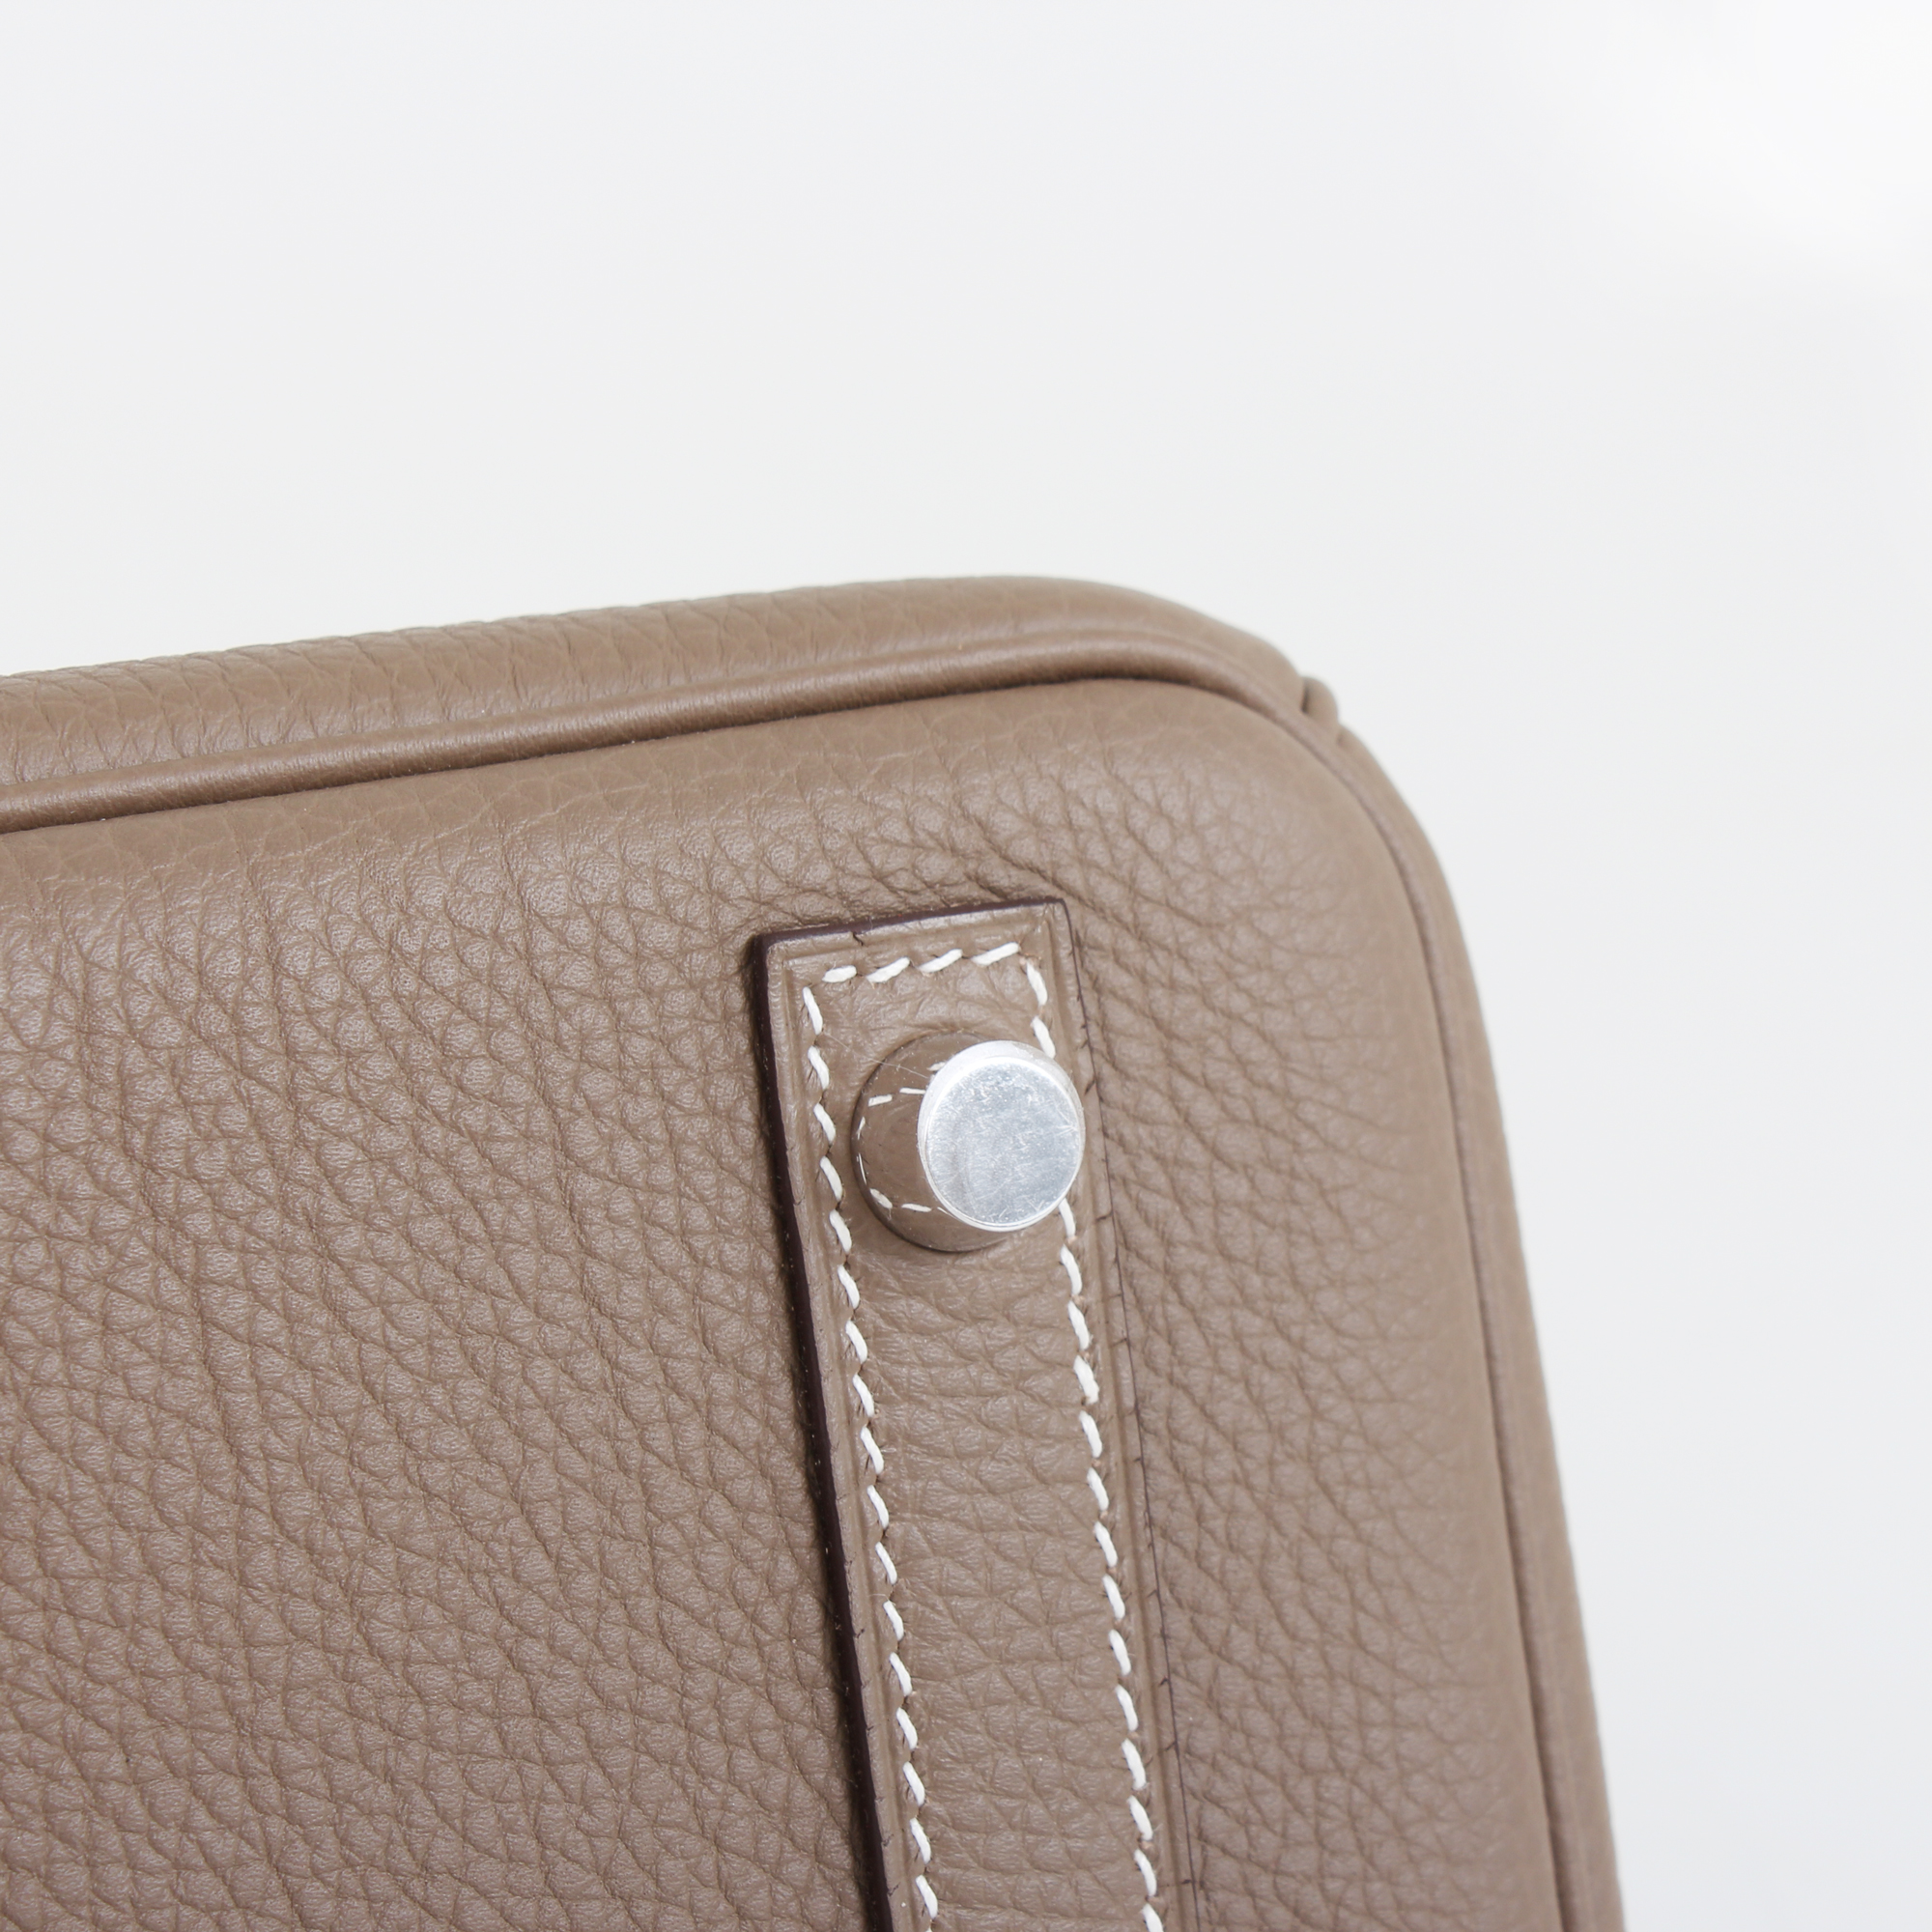 Image of the stud of hermes birkin bag taupe togo